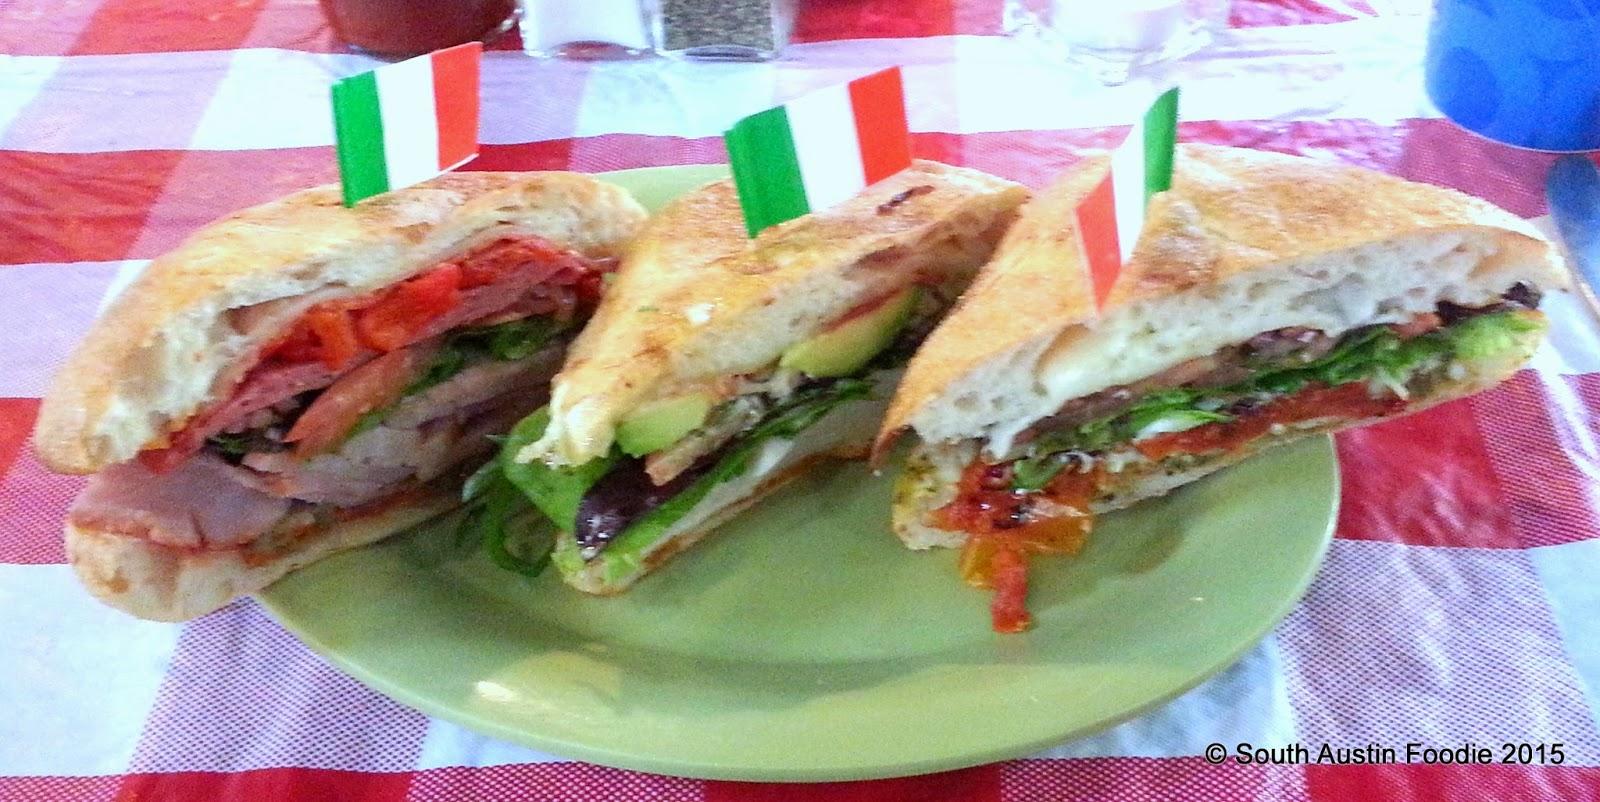 Schlotzsky's -- sandwiches #hoorayitaly